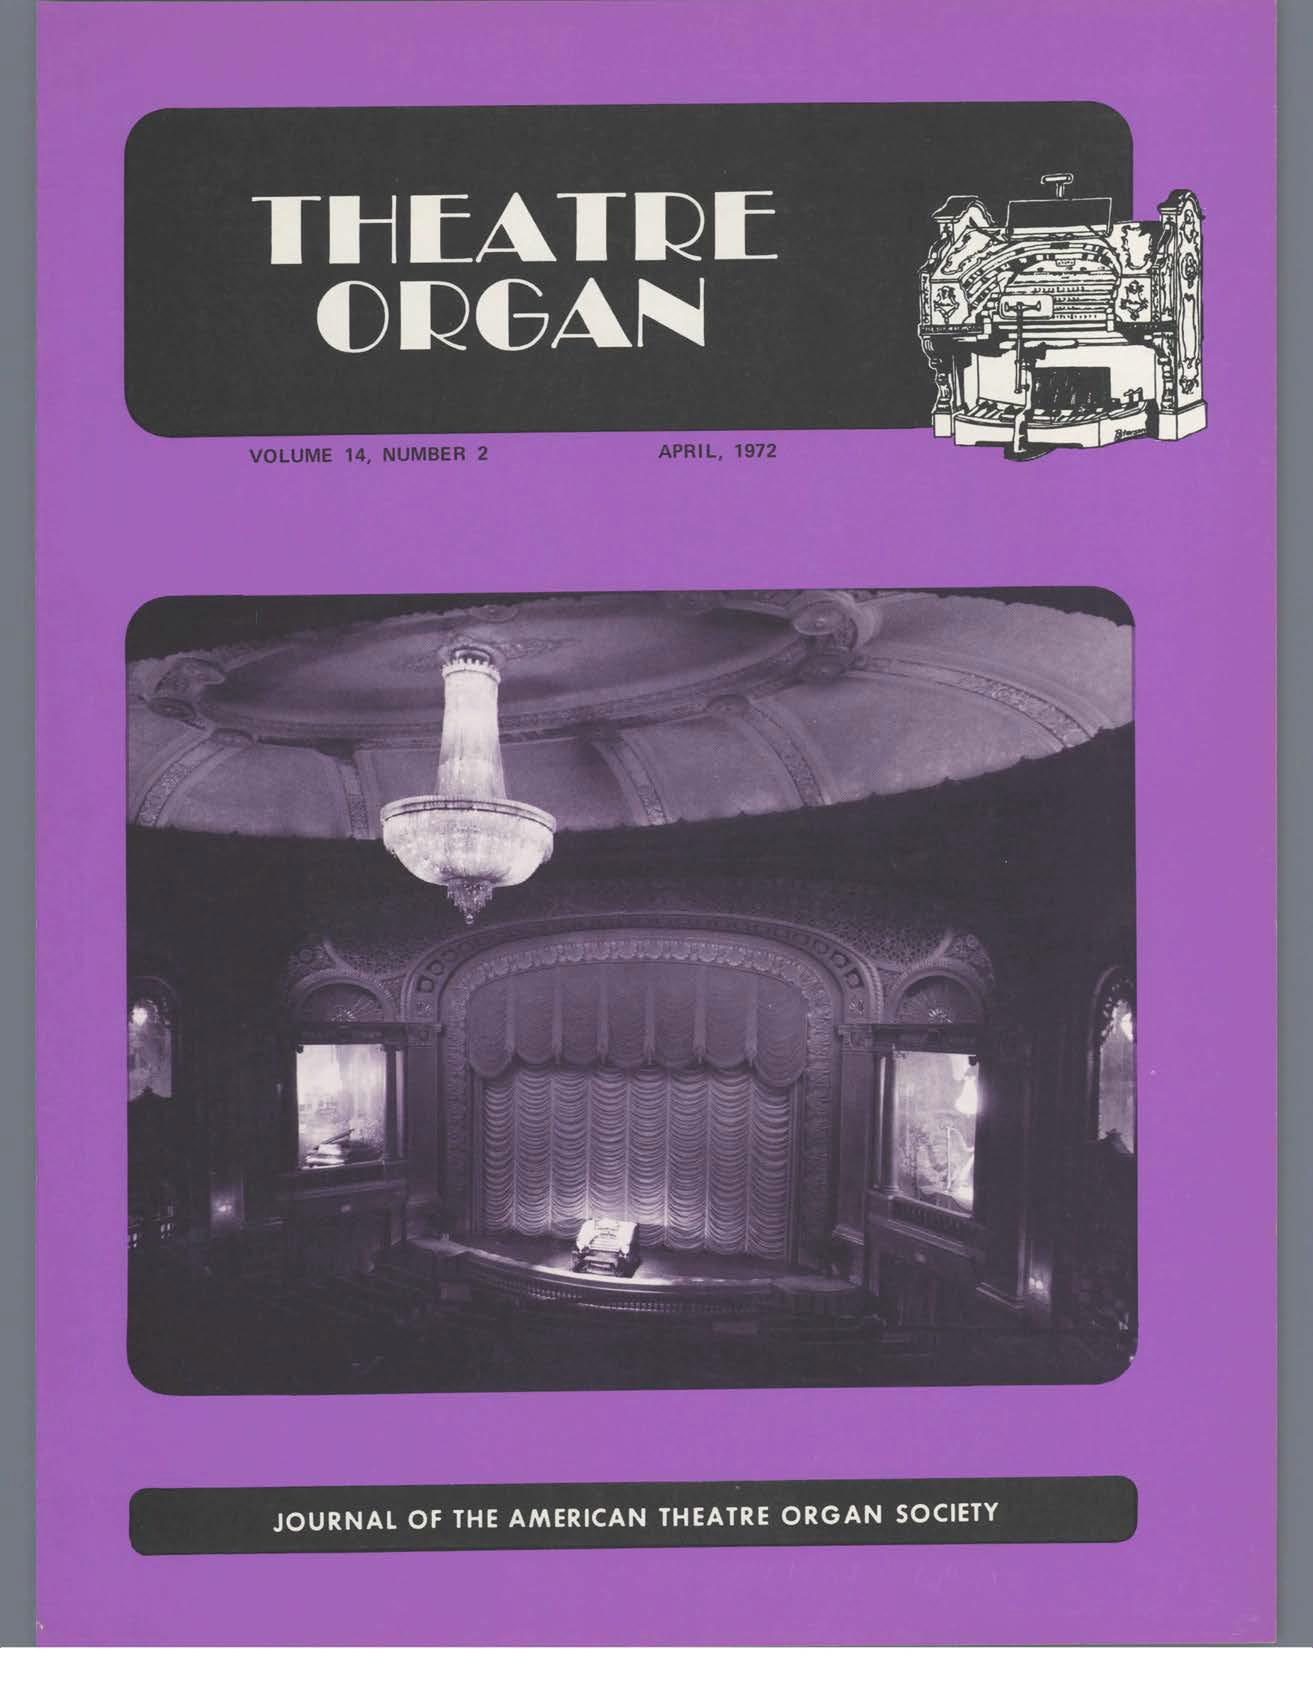 Theatre Organ, April 1972, Volume 14, Number 2